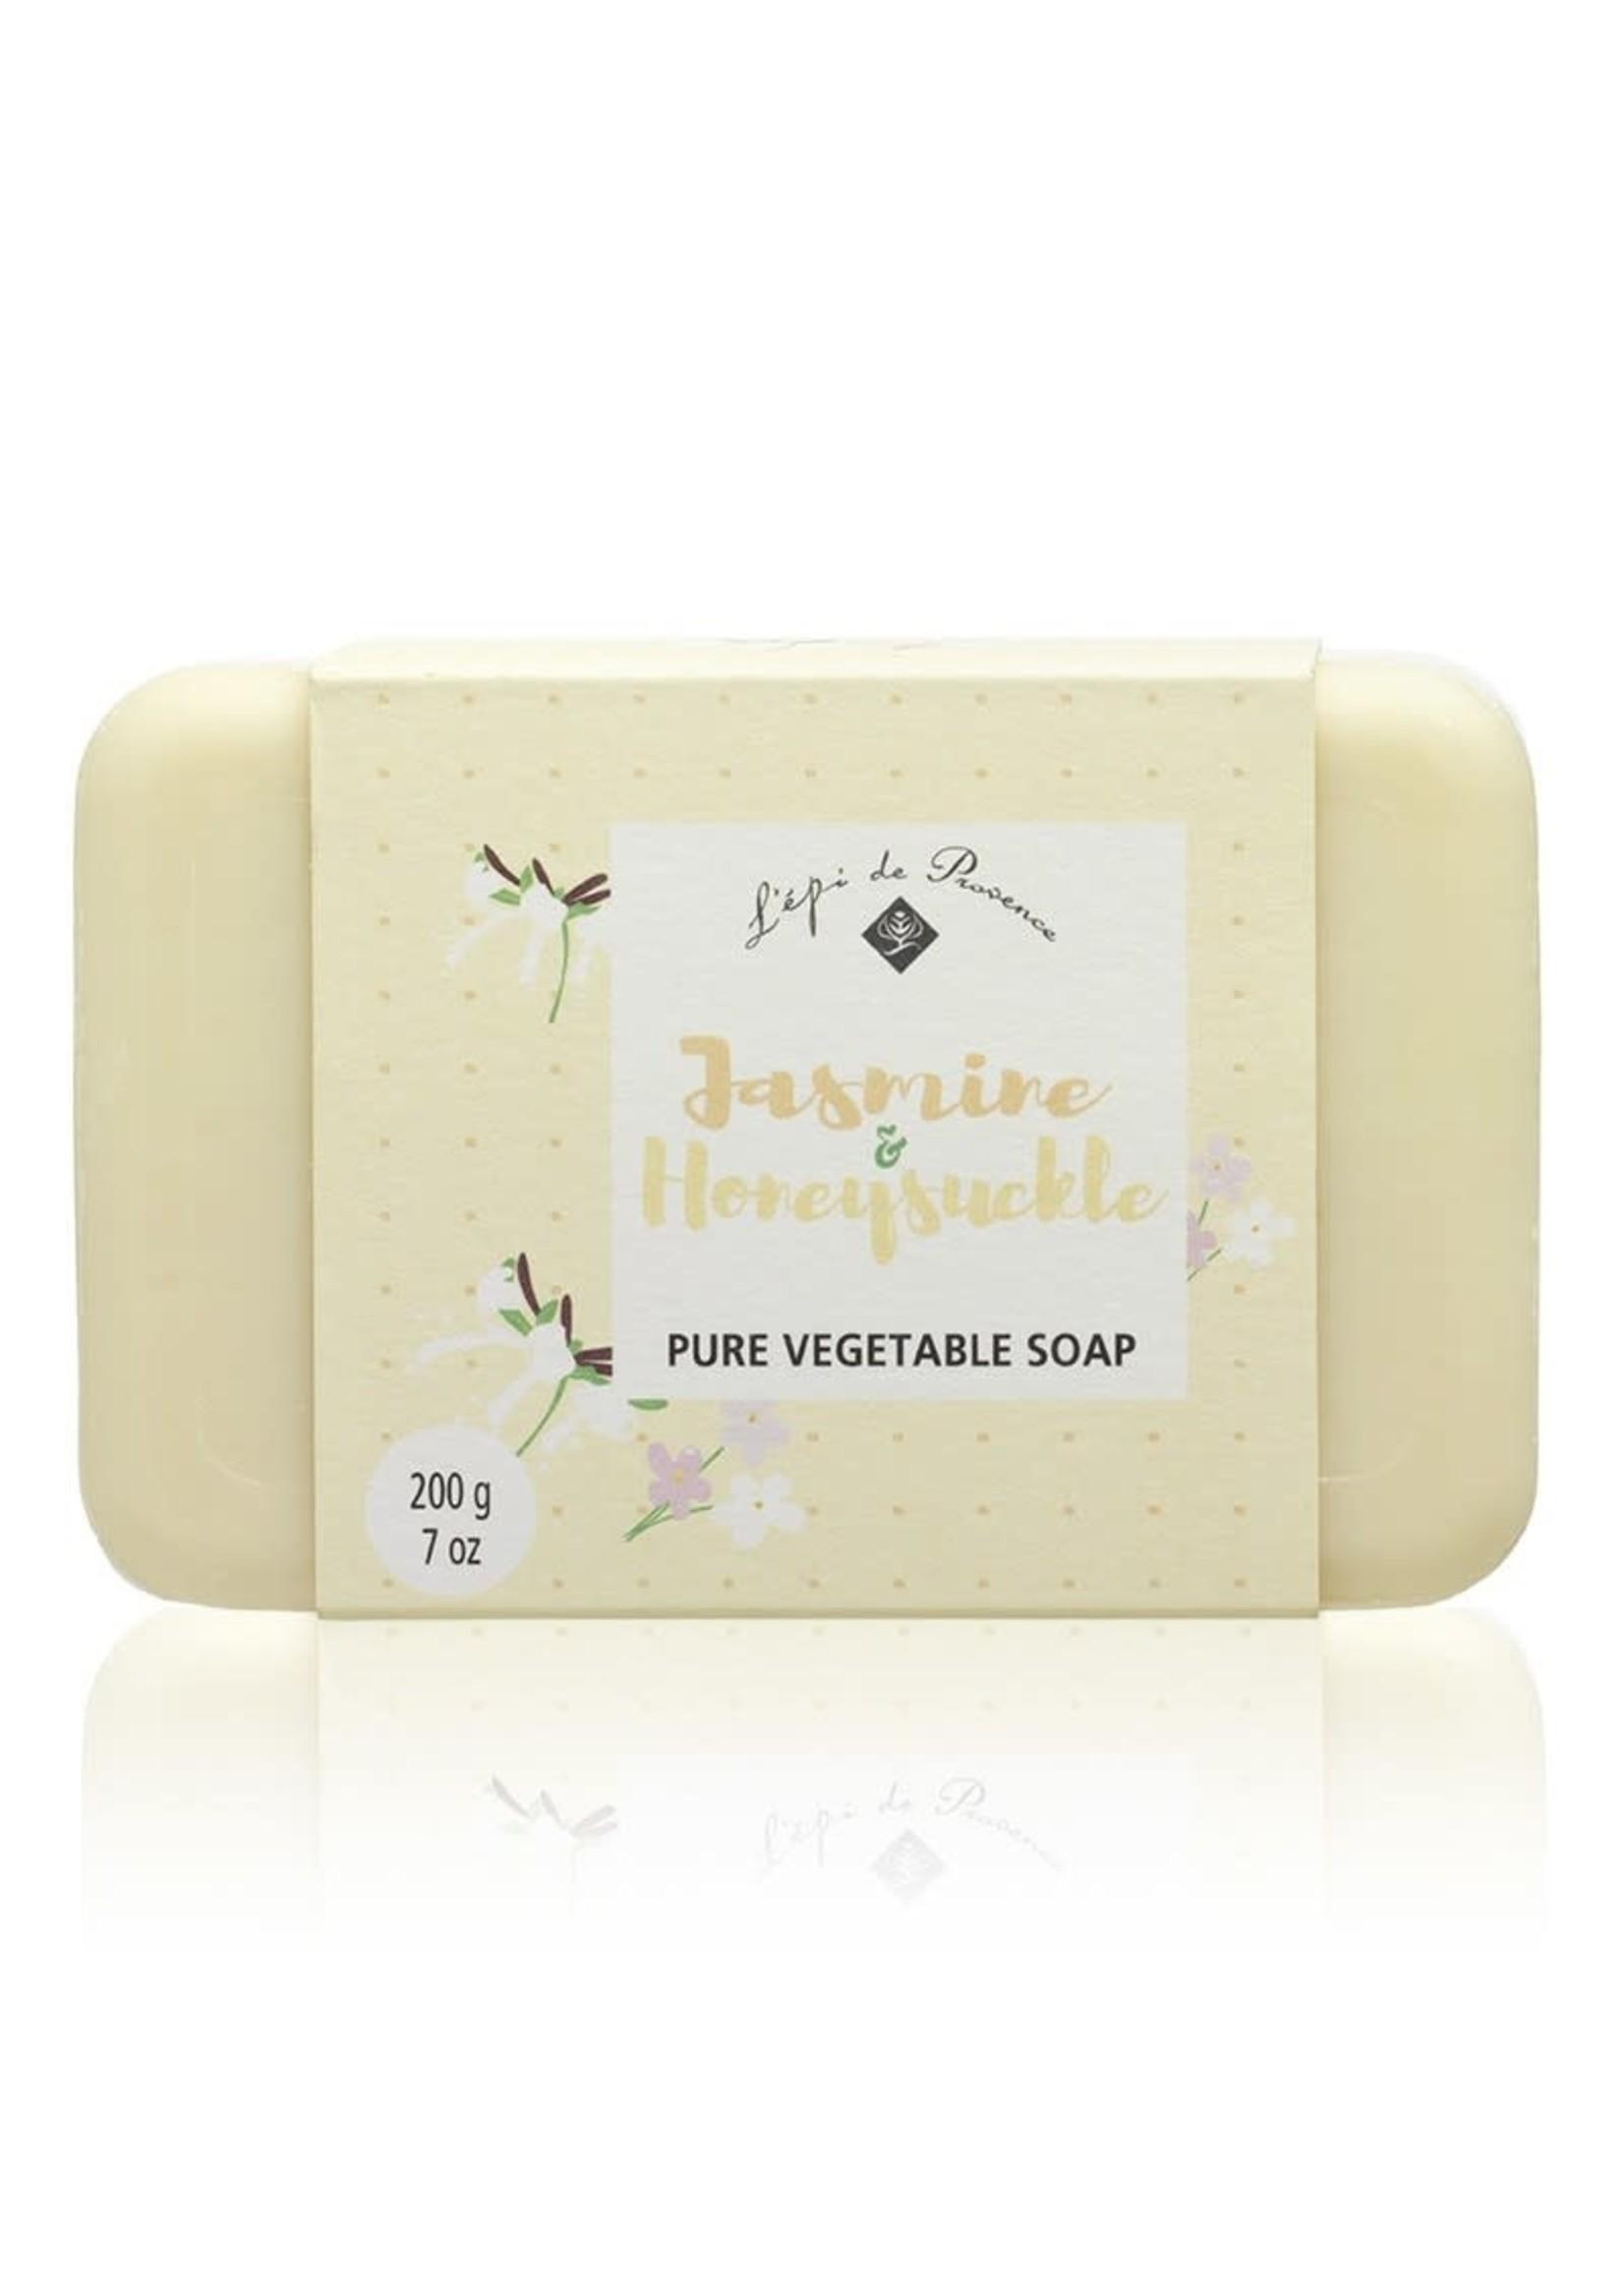 Echo France Soap Jasmine & Honesuckle 200g Soap